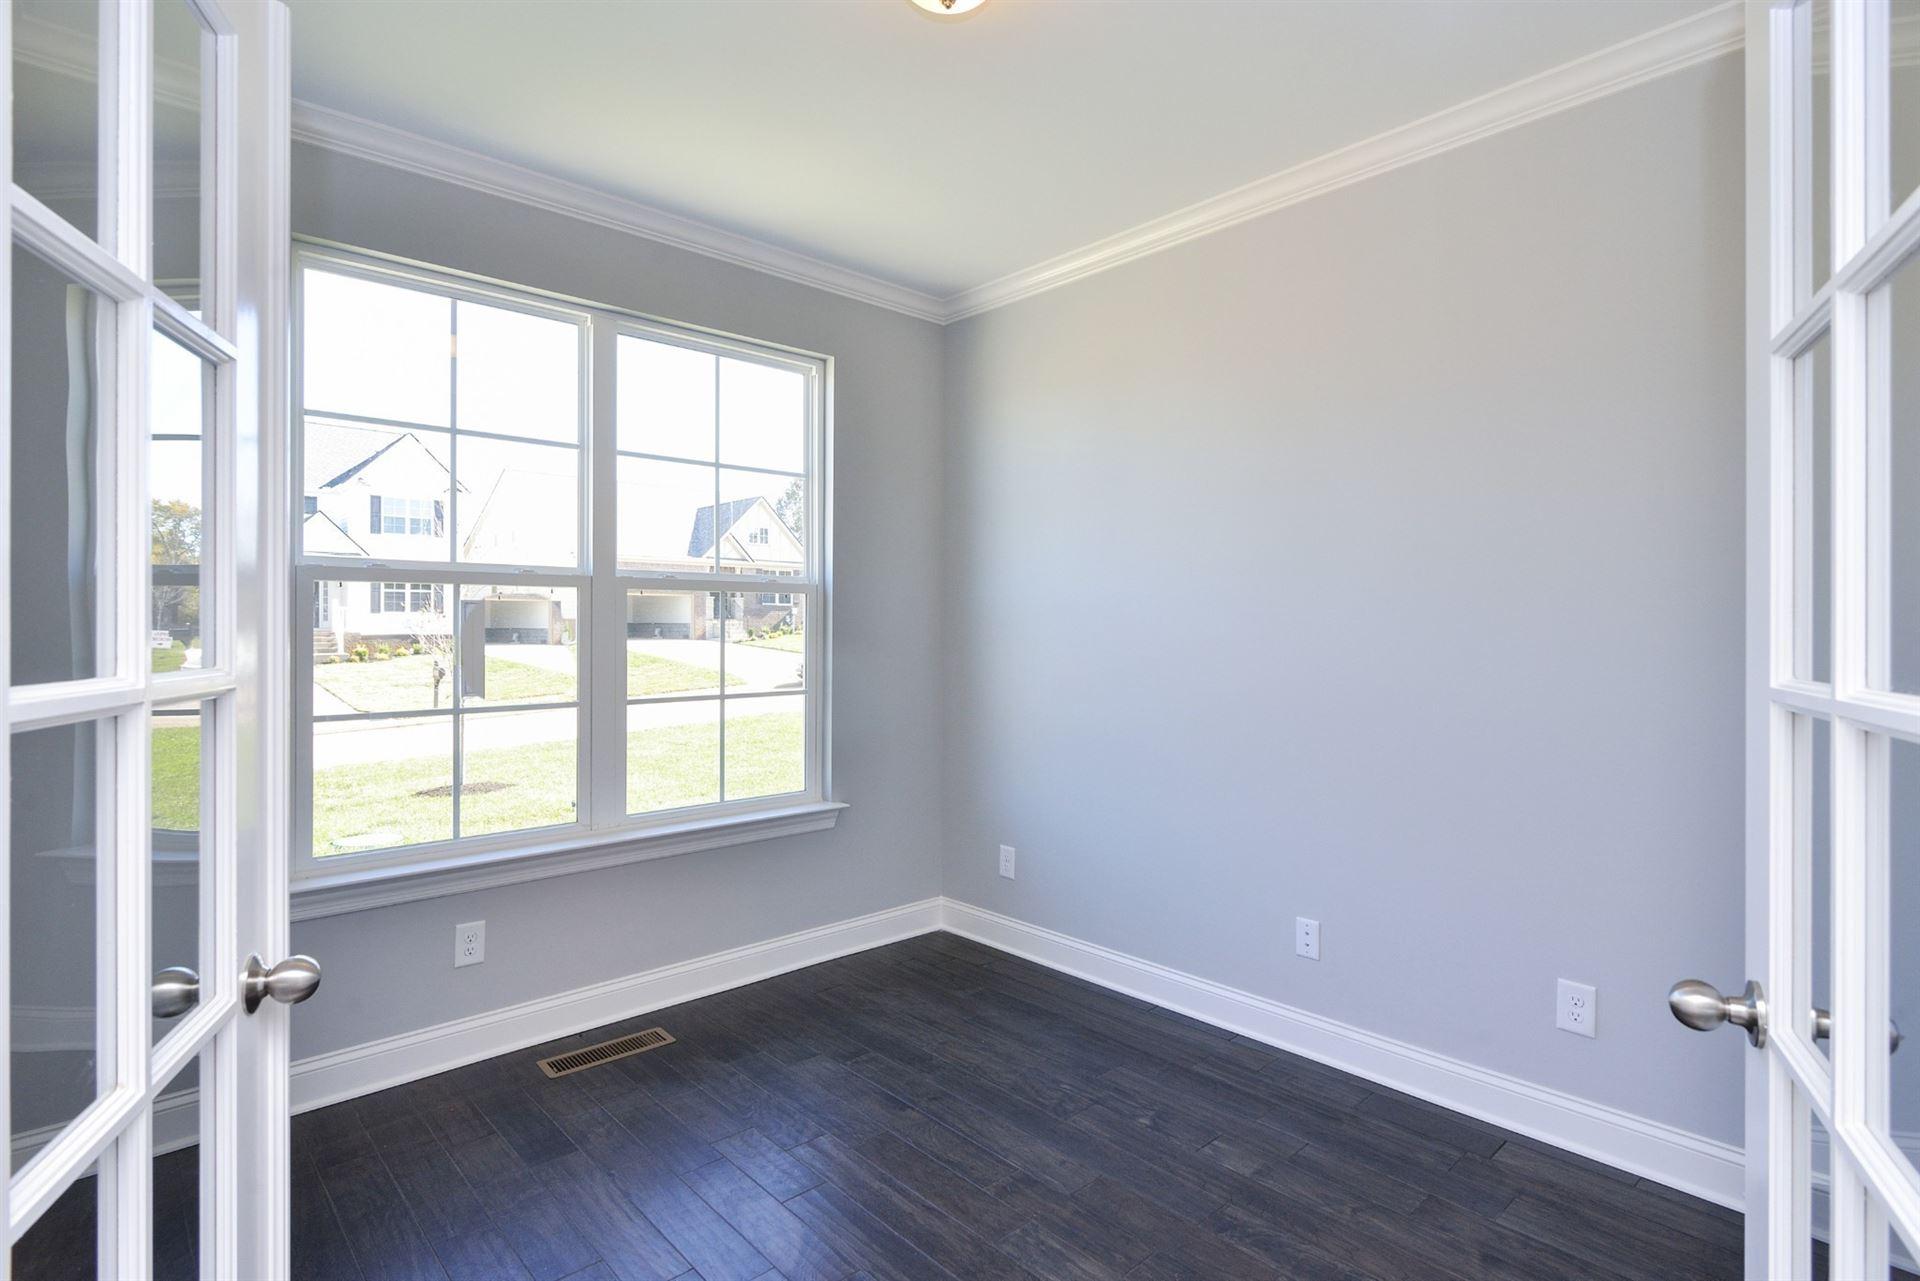 Photo of 331 Van Conder Place, Lot 36, Hendersonville, TN 37075 (MLS # 2243417)